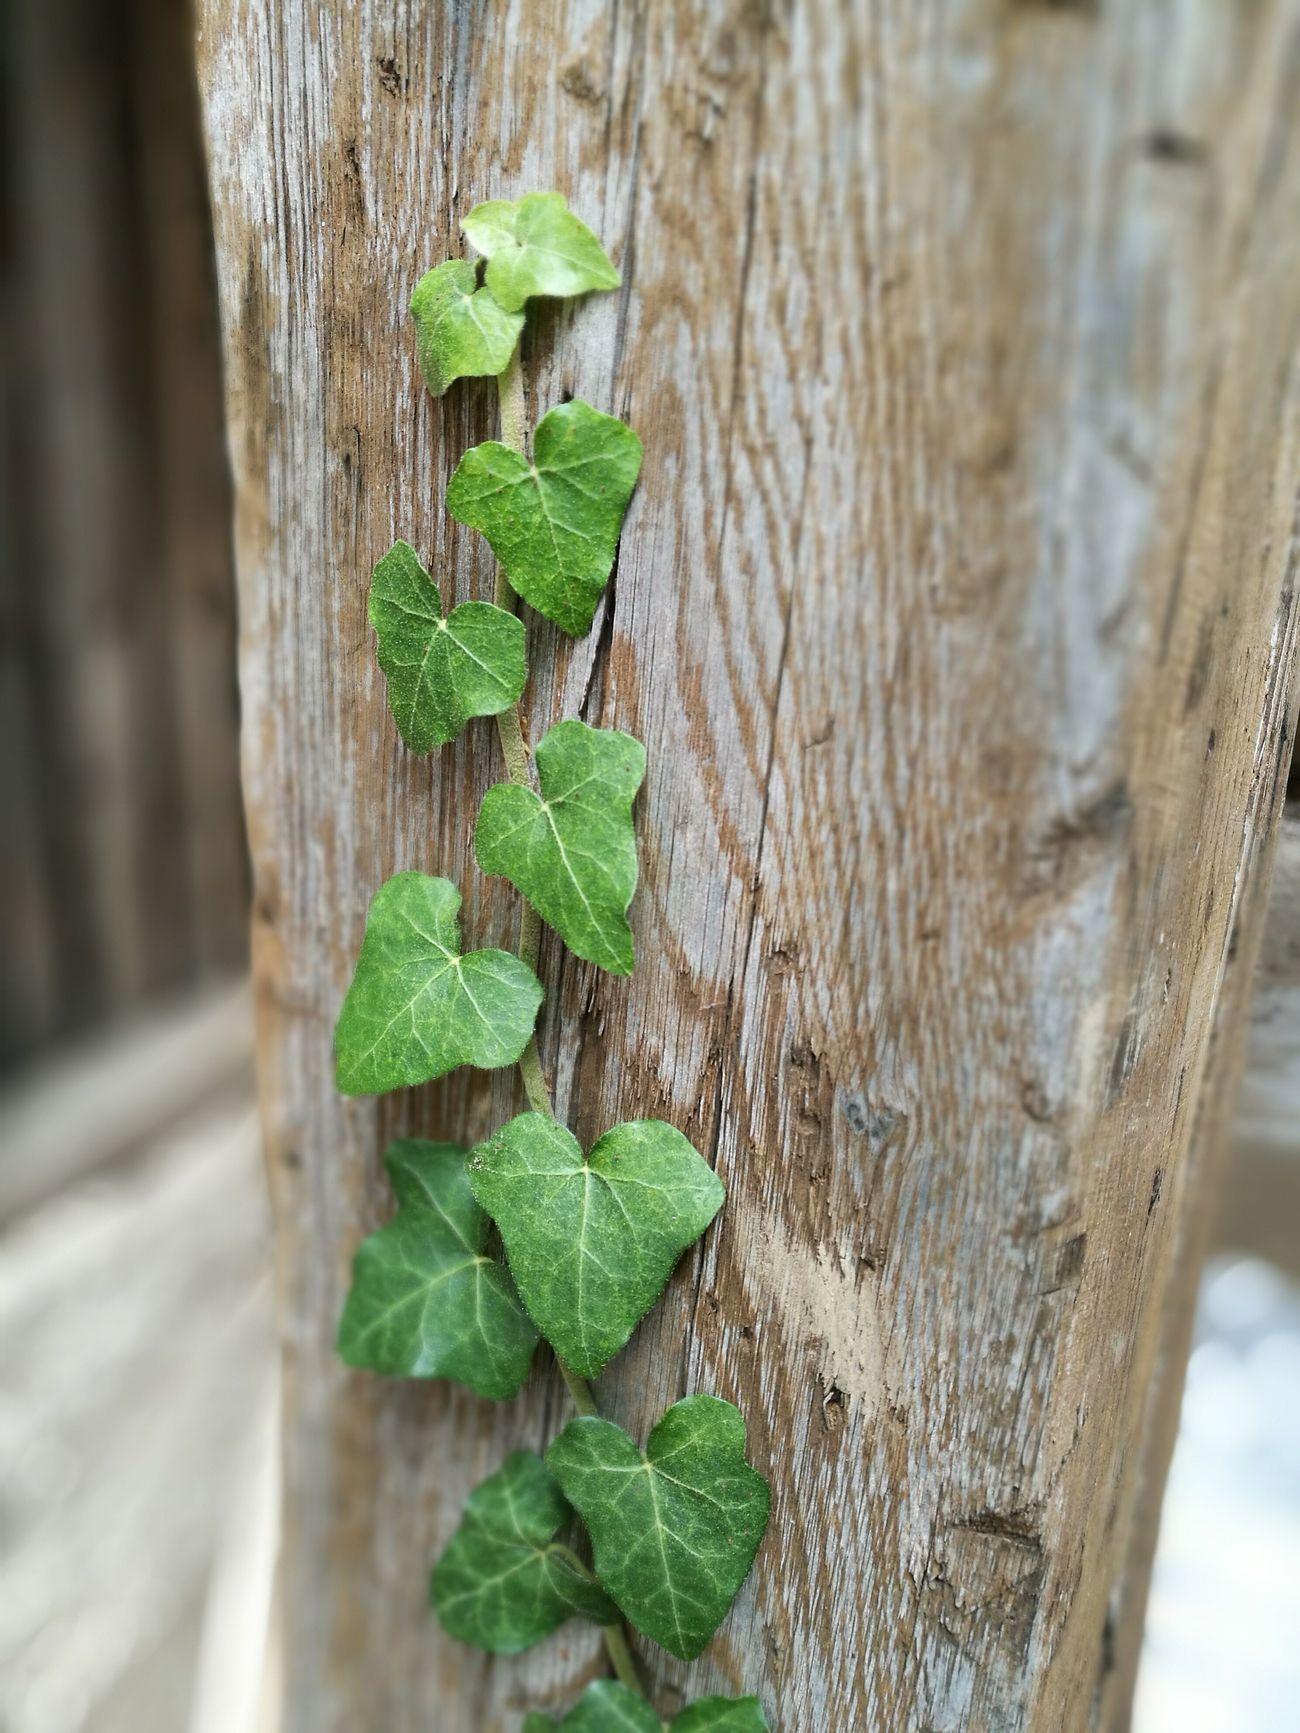 Spontan am Hauseingang gefunden. Leaf Green Color Close-up Wood - Material Frenkendorf First Eyeem Photo